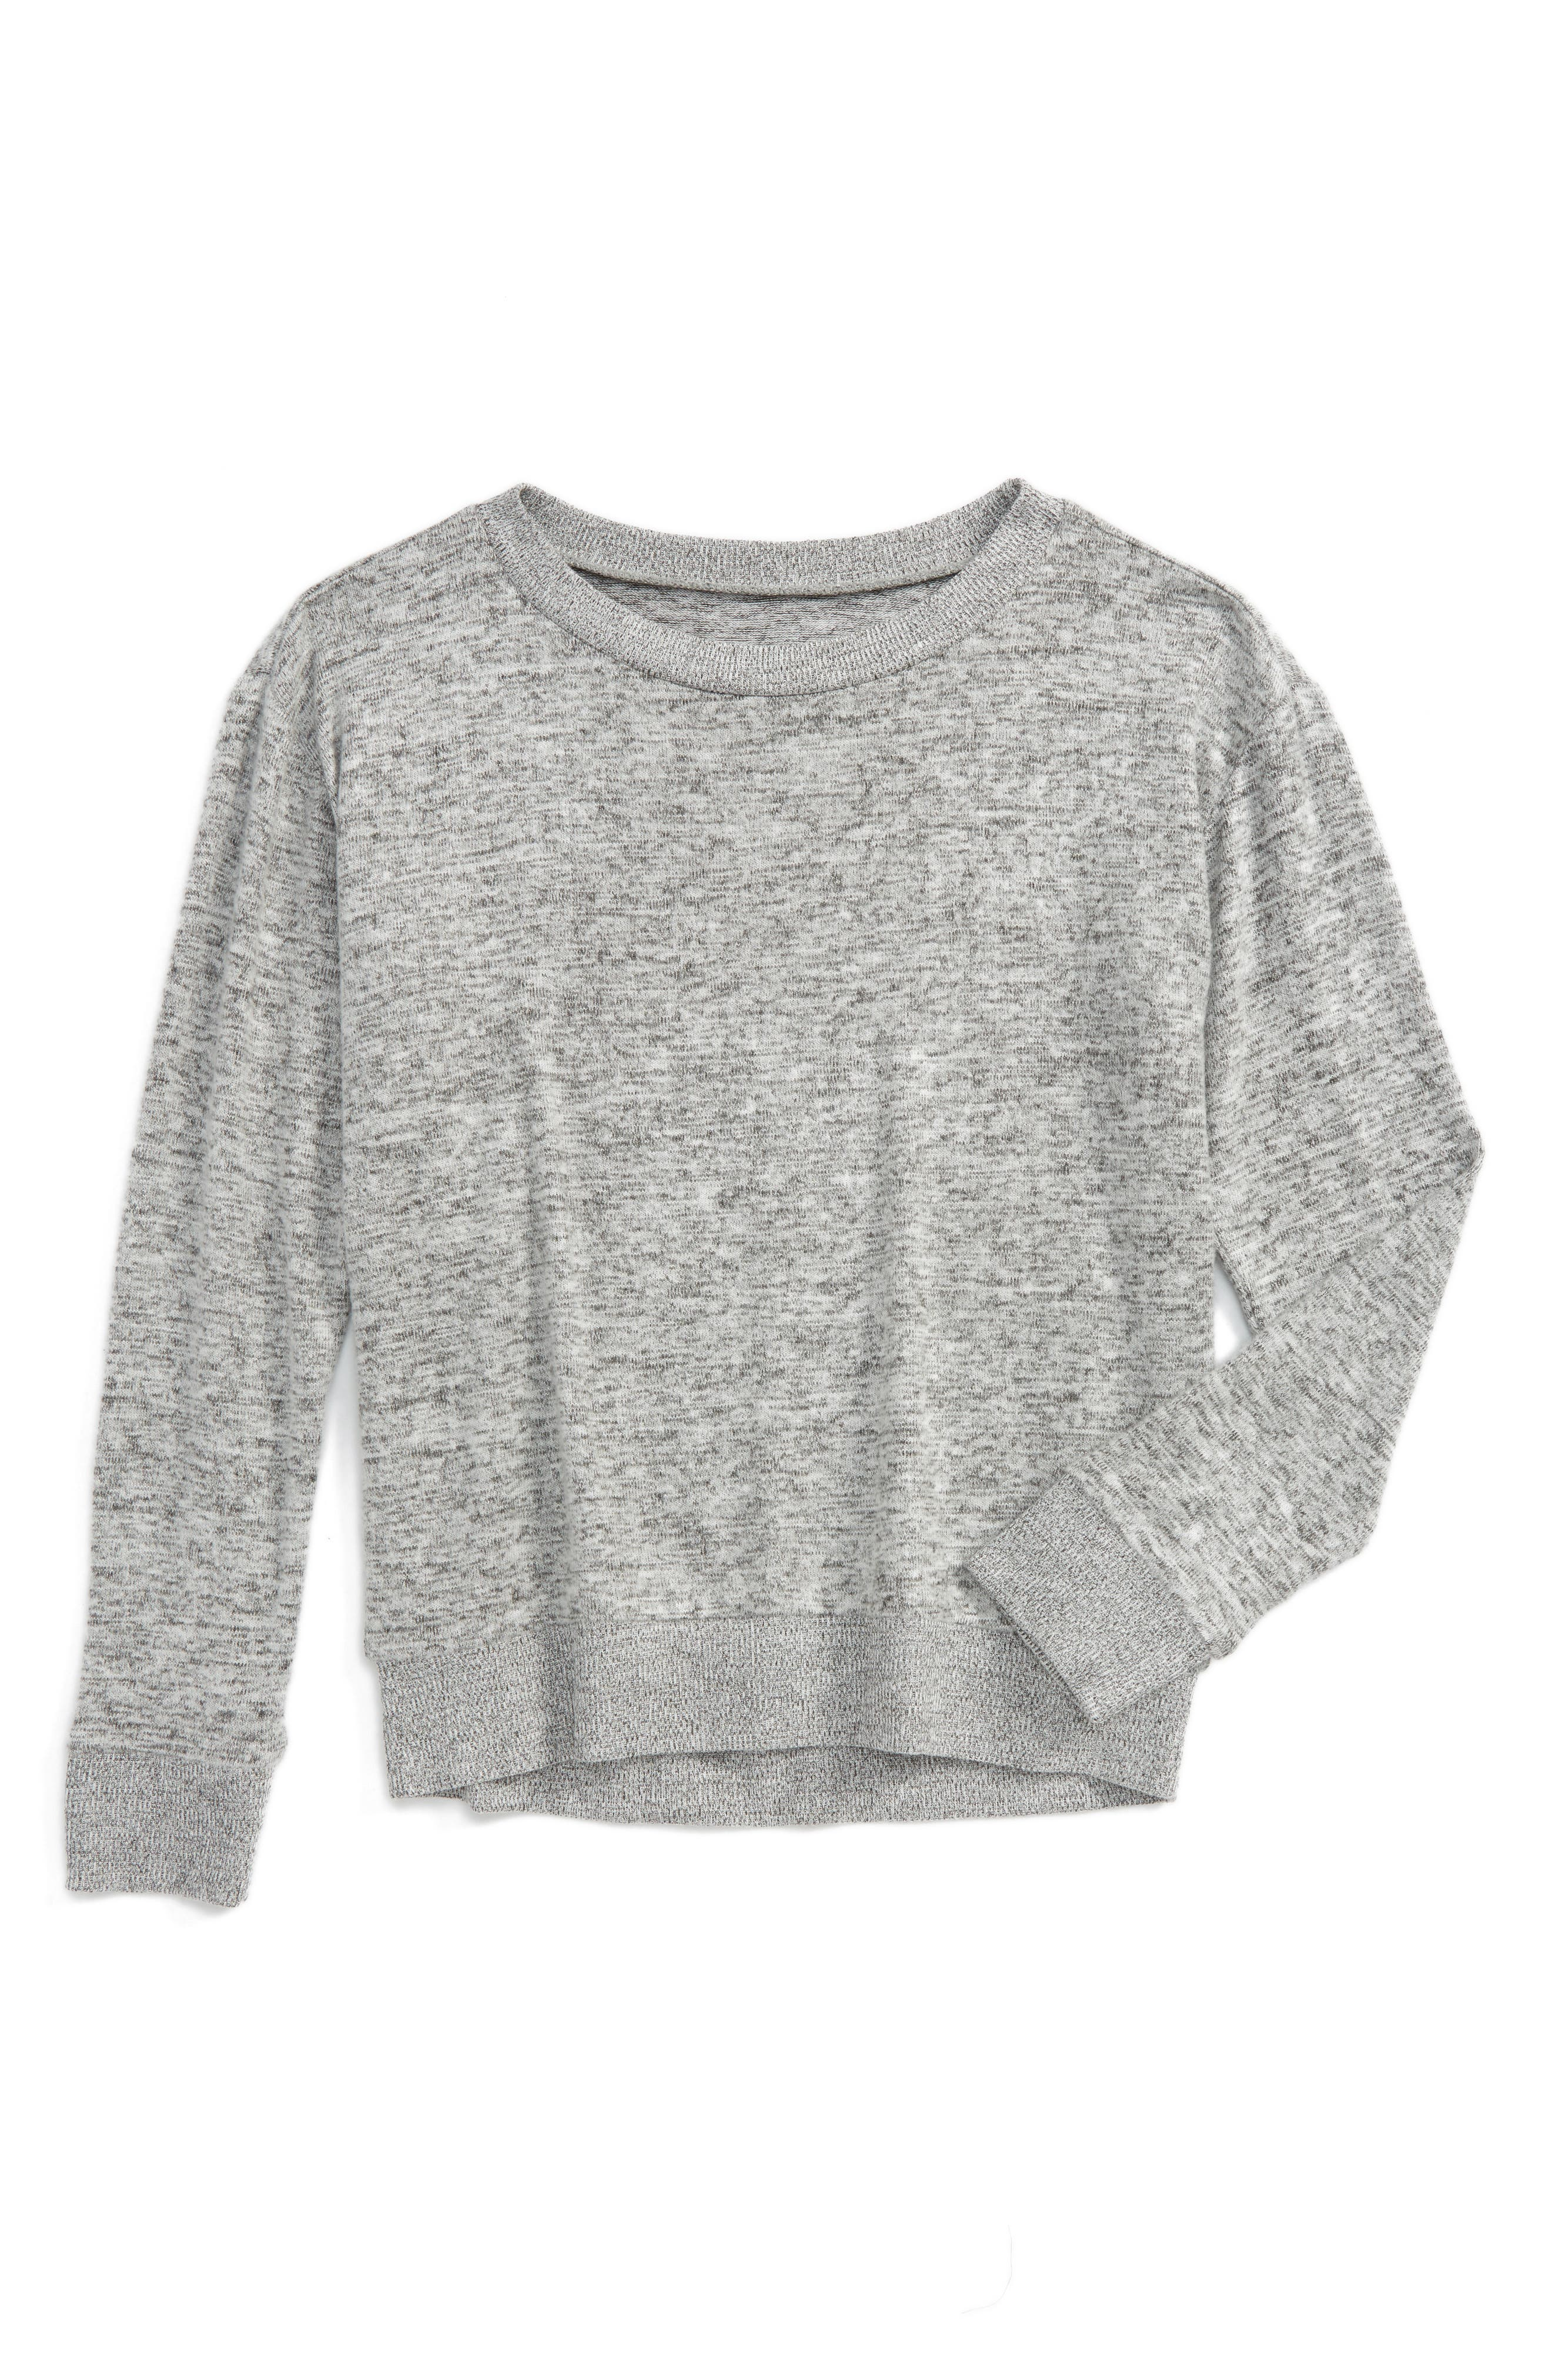 Main Image - Zella Girl Supersoft Sweater (Little Girls & Big Girls)